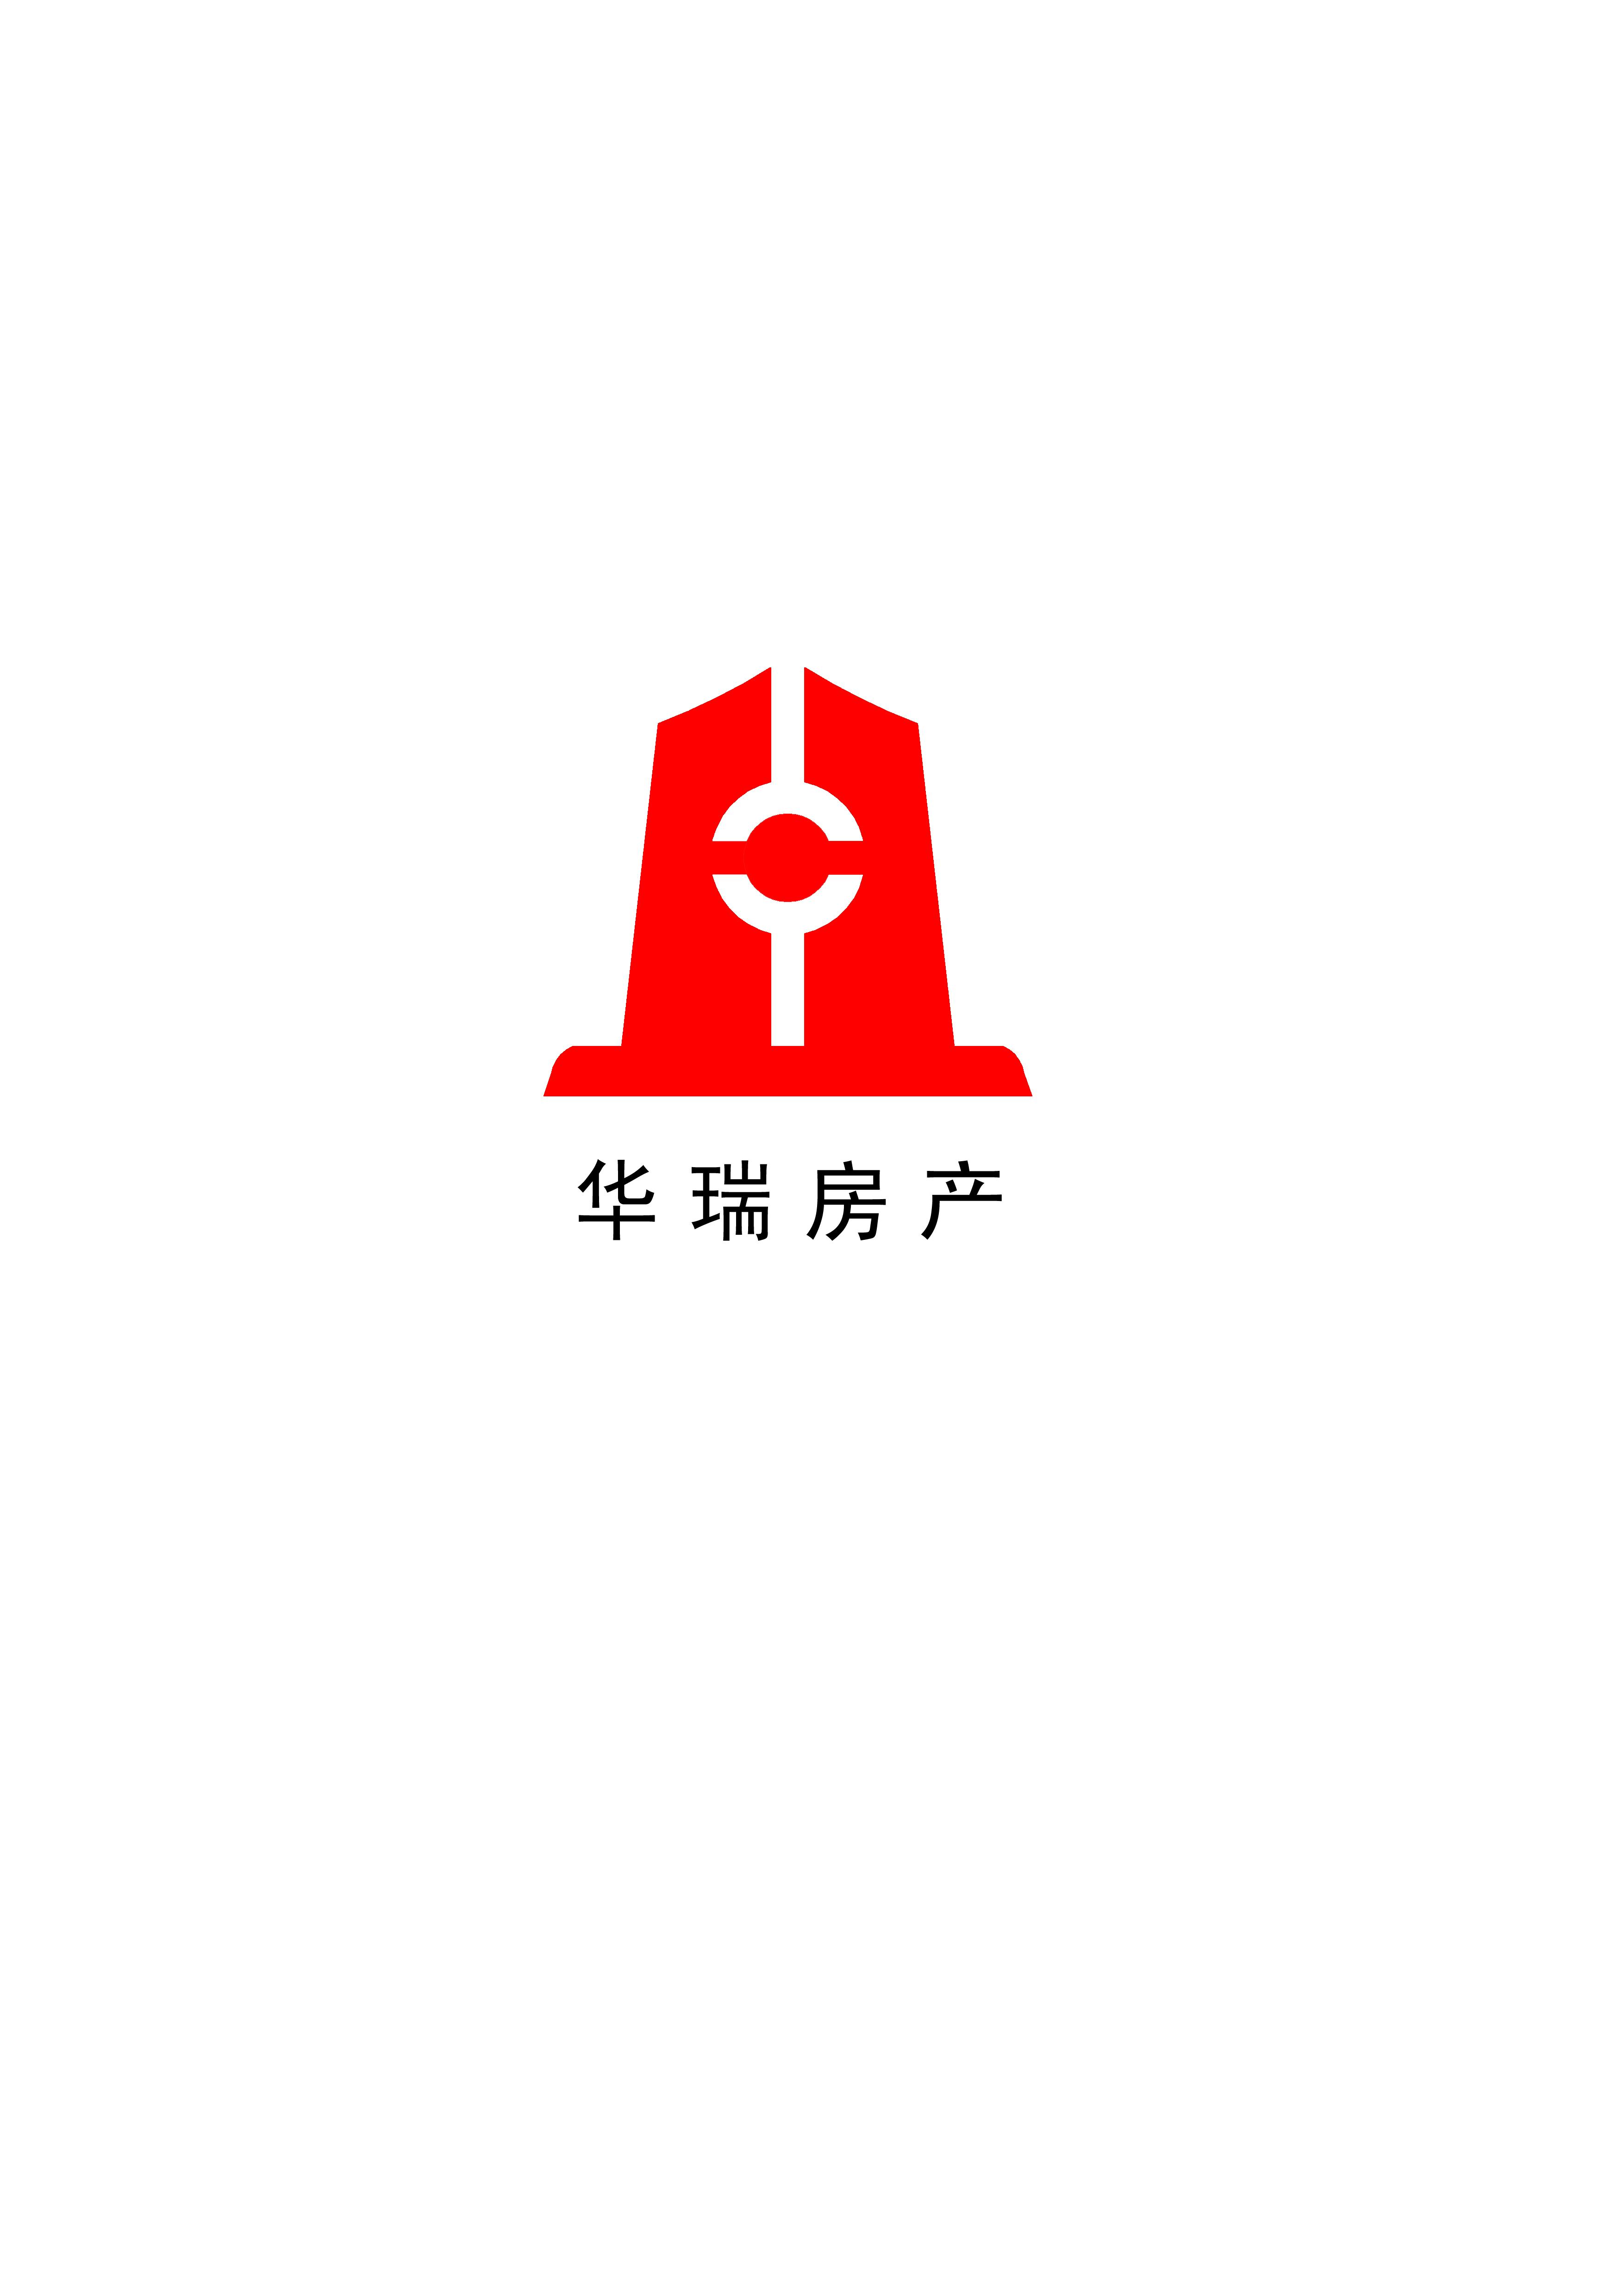 logo logo 标志 设计 图标 3508_4961 竖版 竖屏